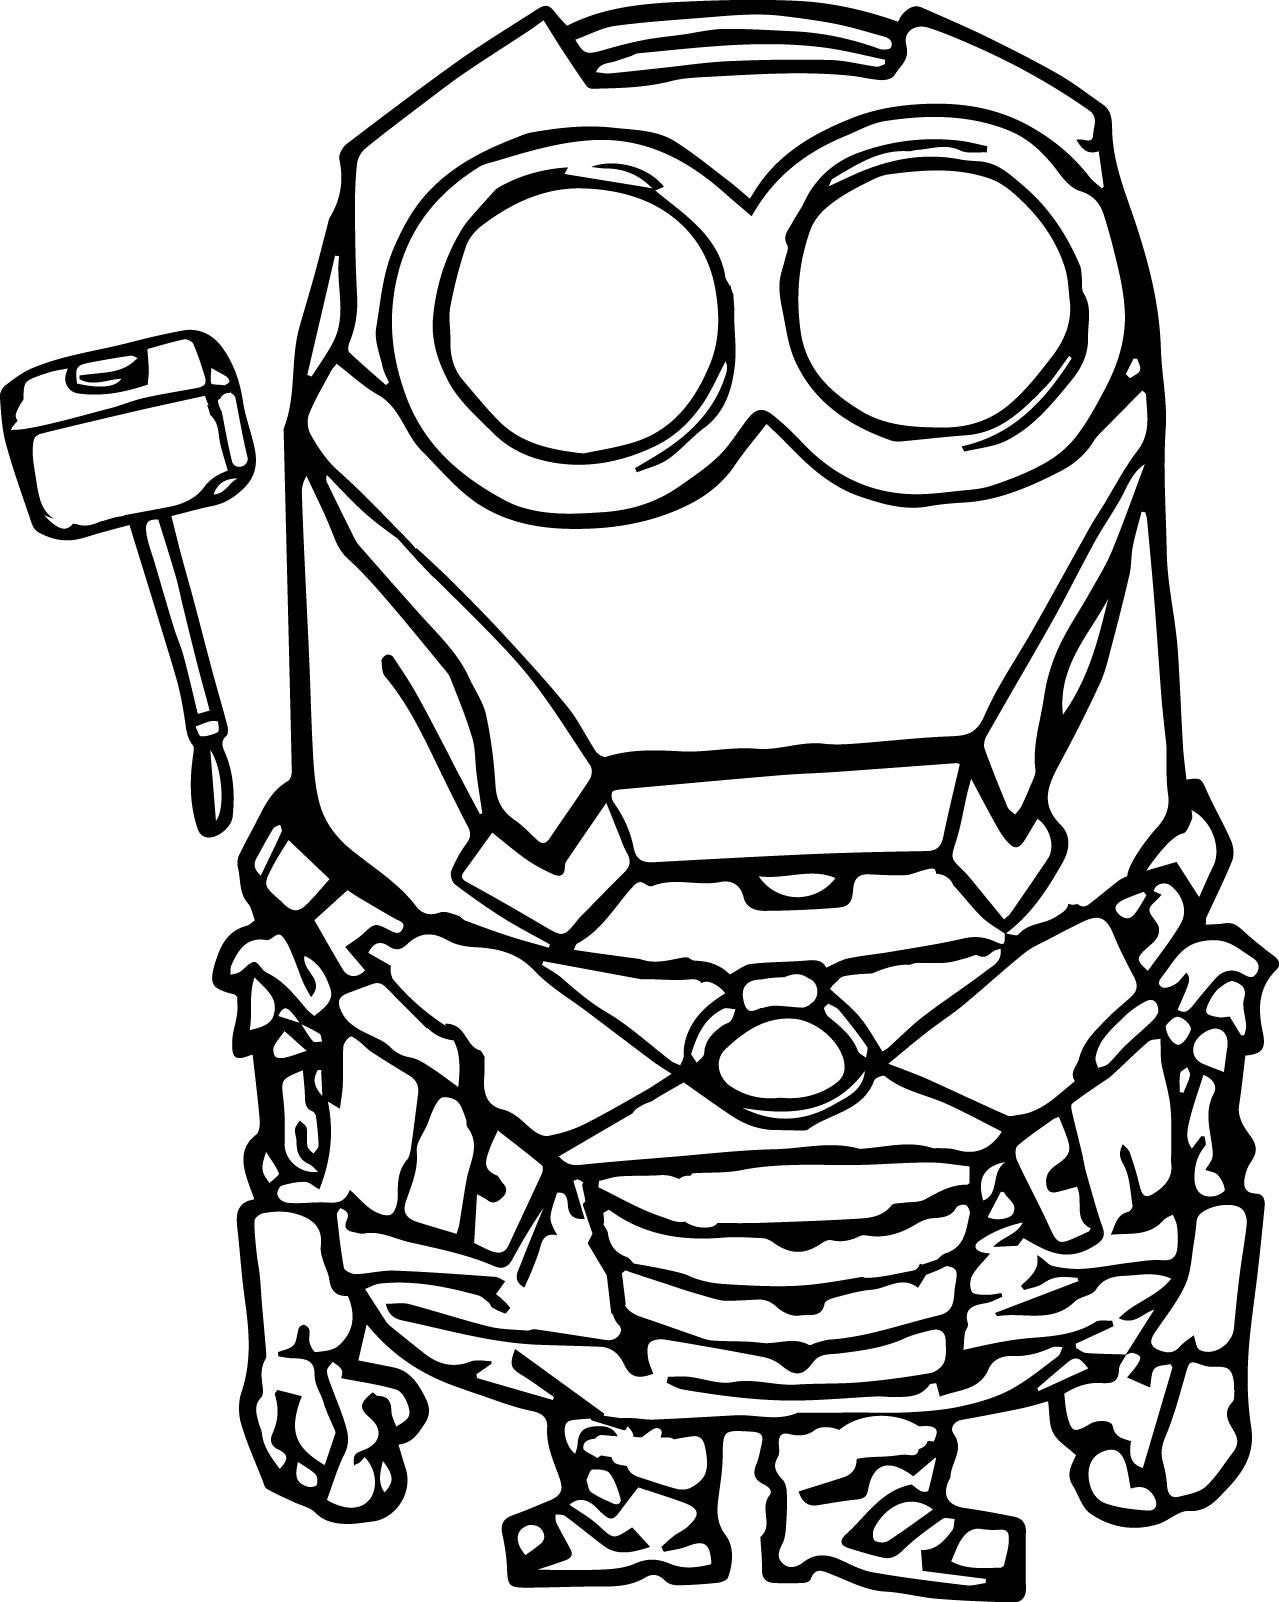 Robot-Minion-Coloring-Page